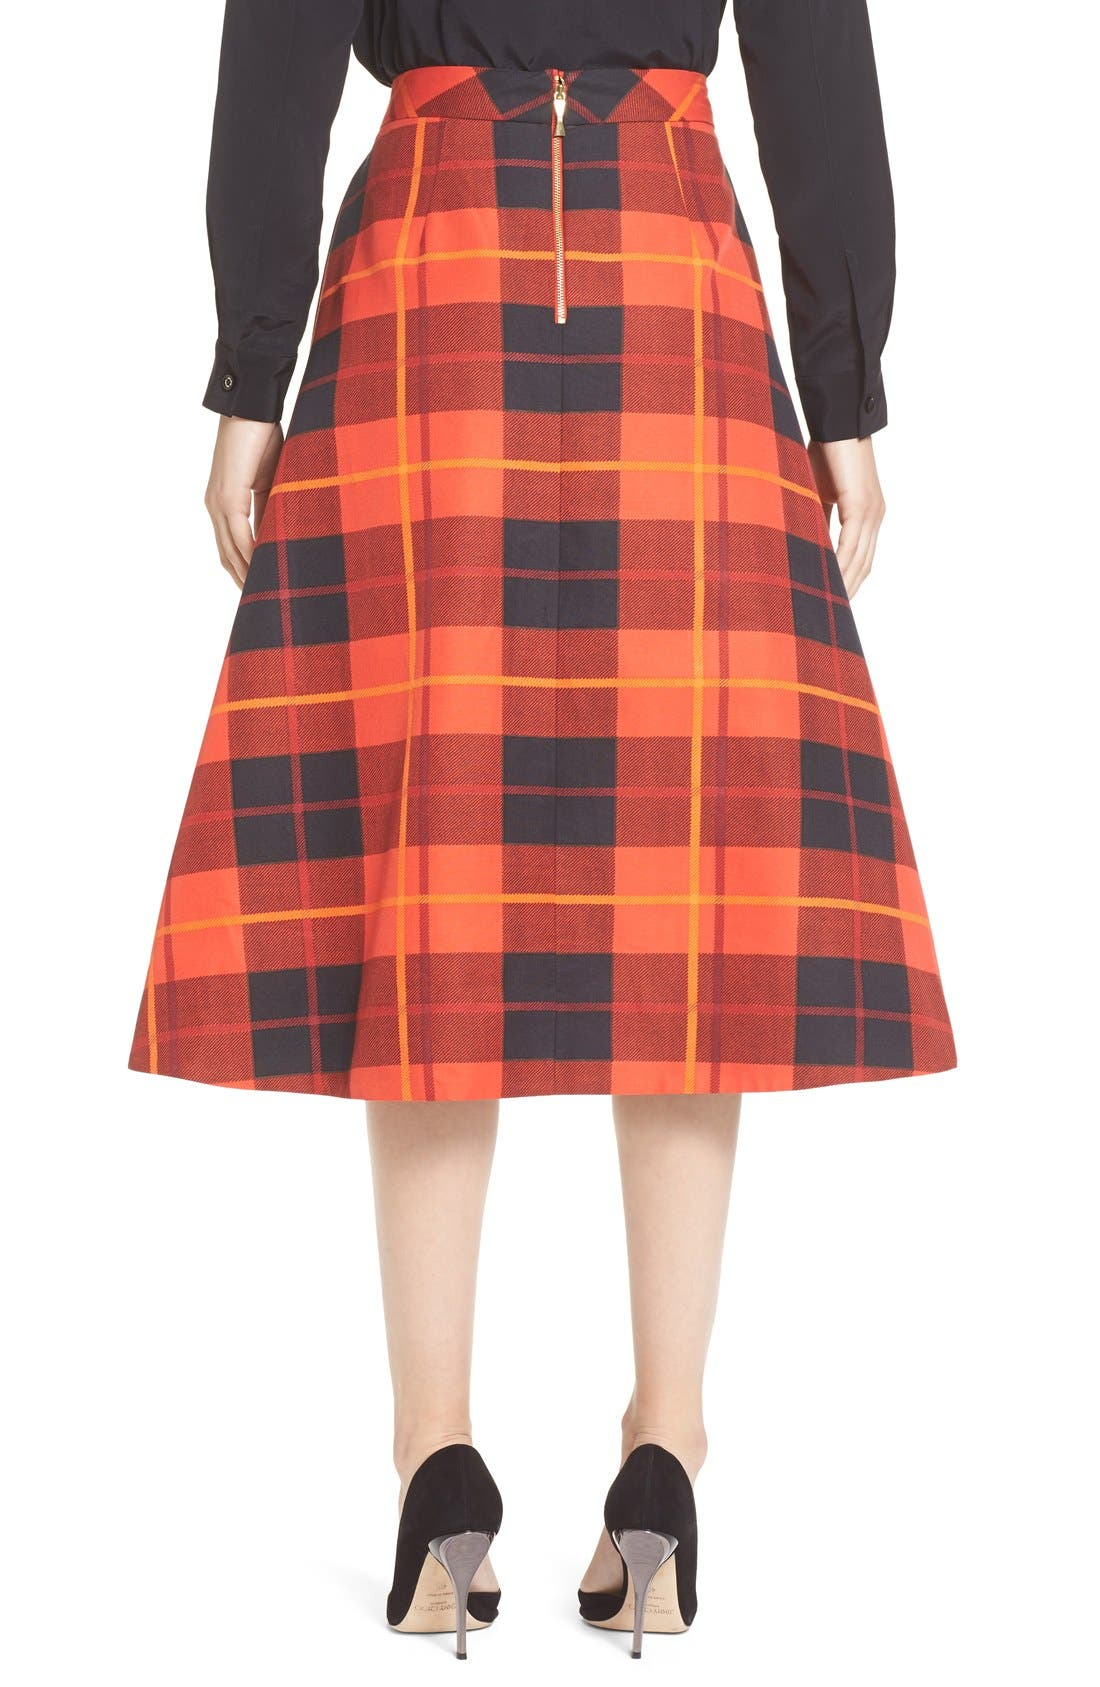 KATE SPADE NEW YORK,                             katespade new yorkwoodland plaid midi skirt,                             Alternate thumbnail 5, color,                             601